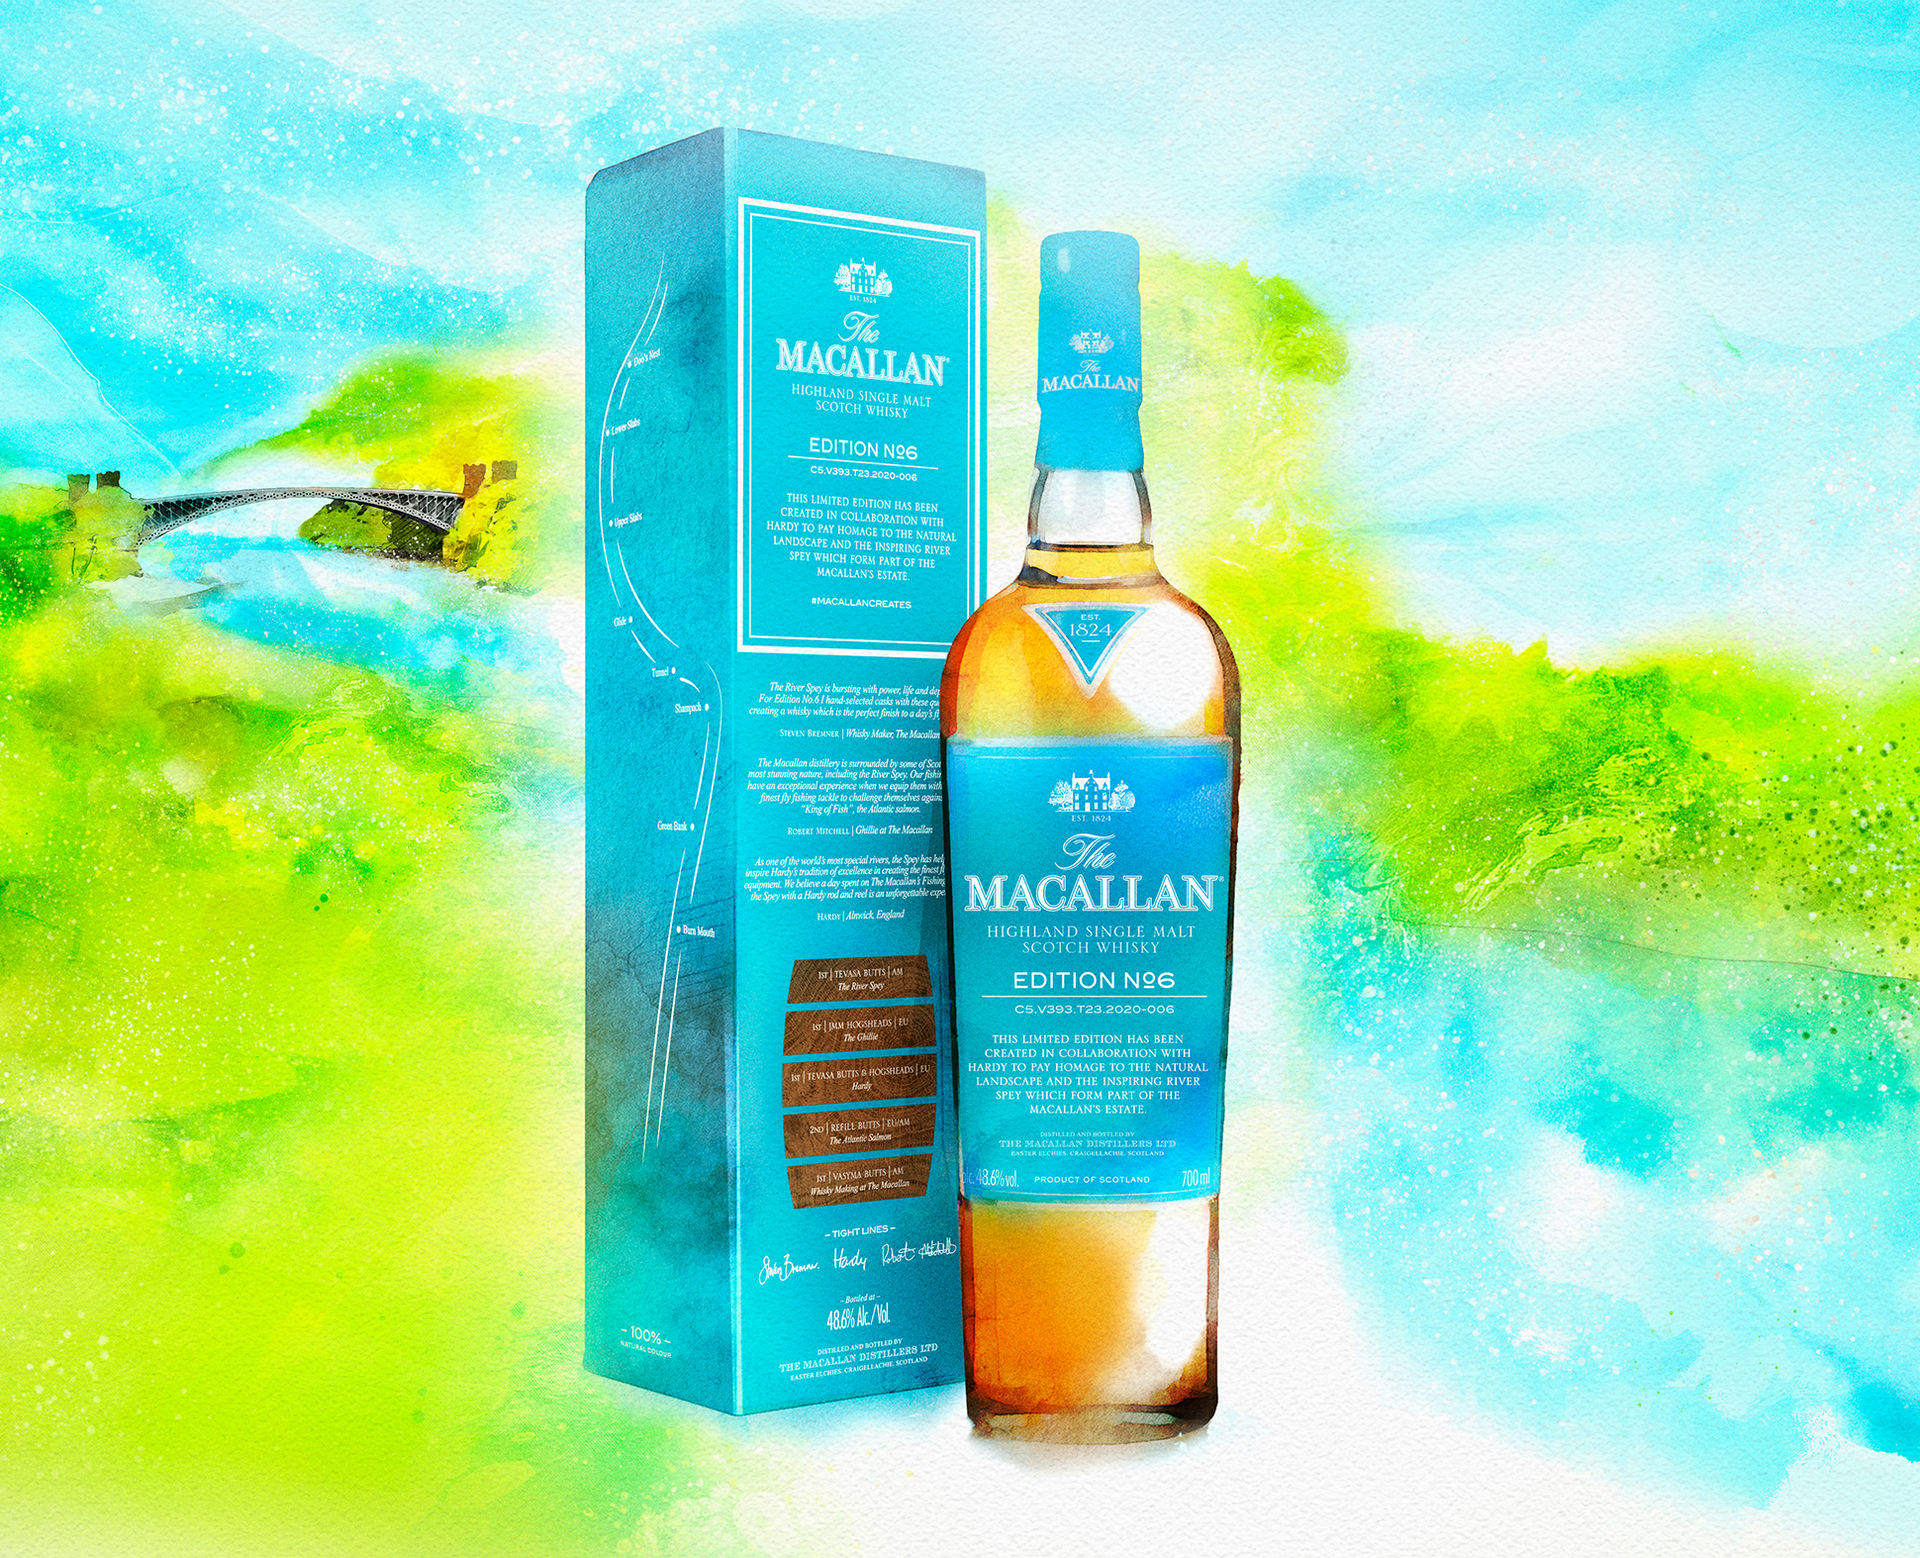 Ny whisky från Macallan